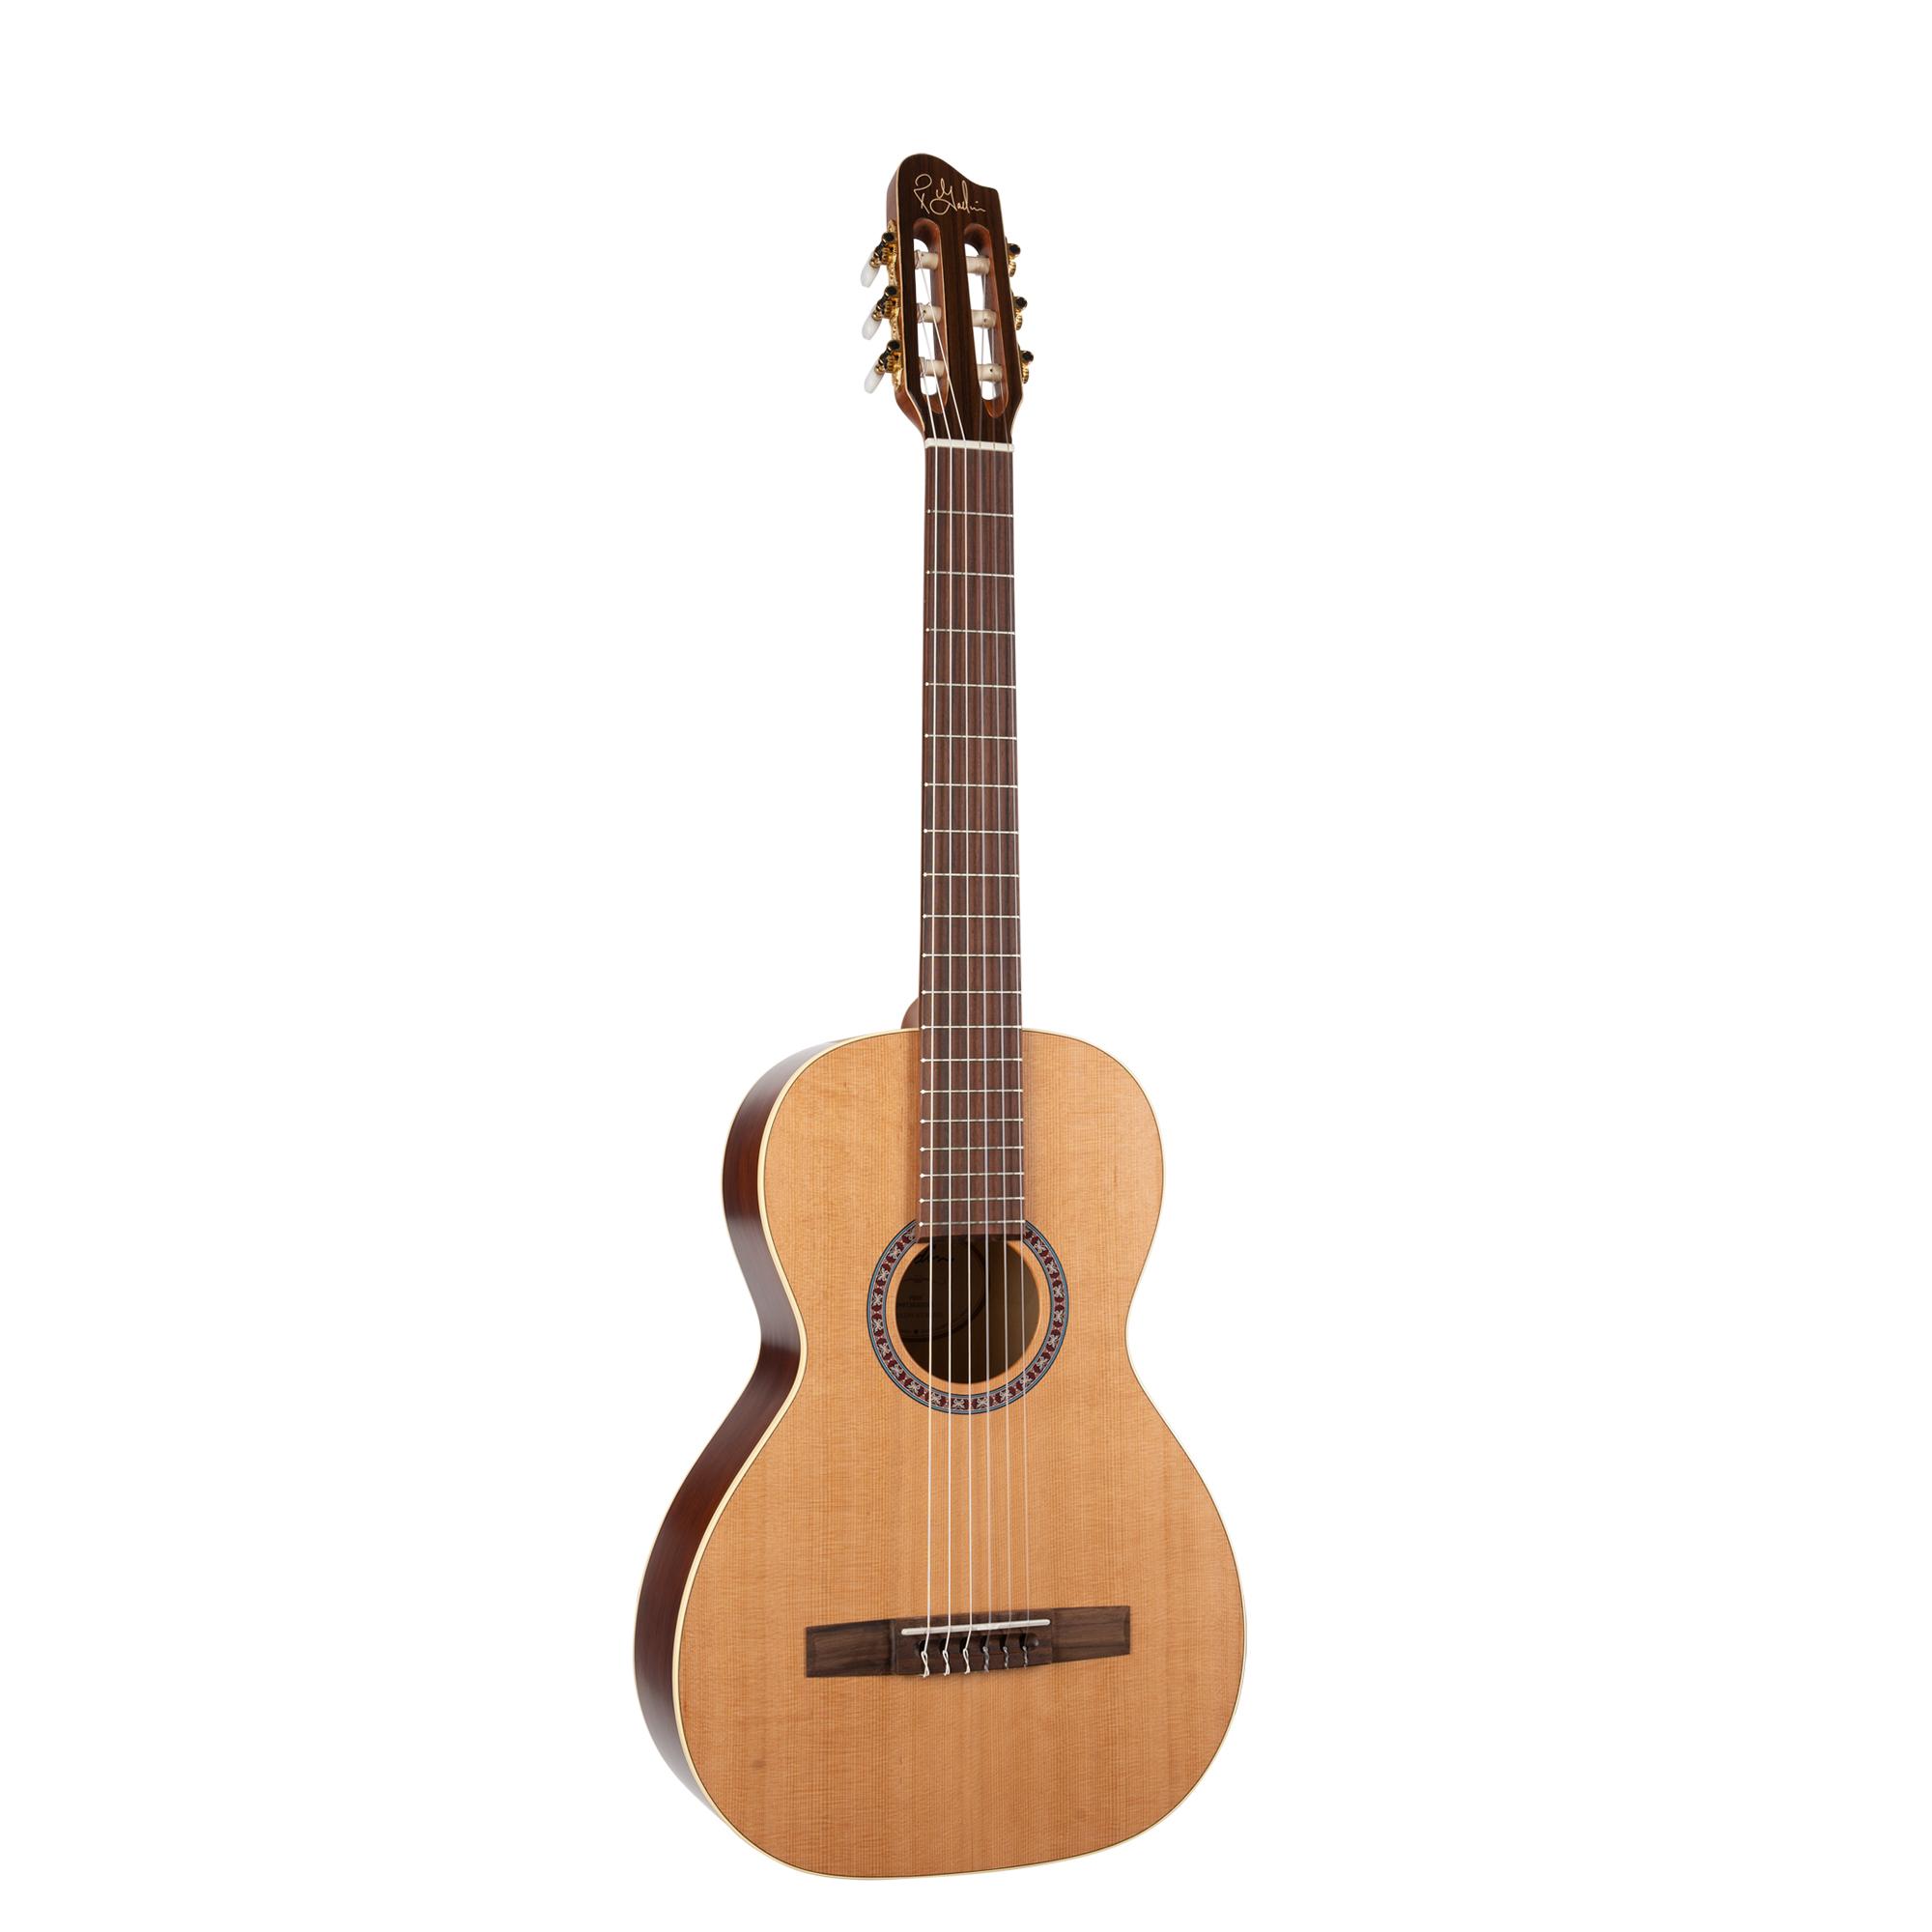 Godin Motif Acoustic Guitar